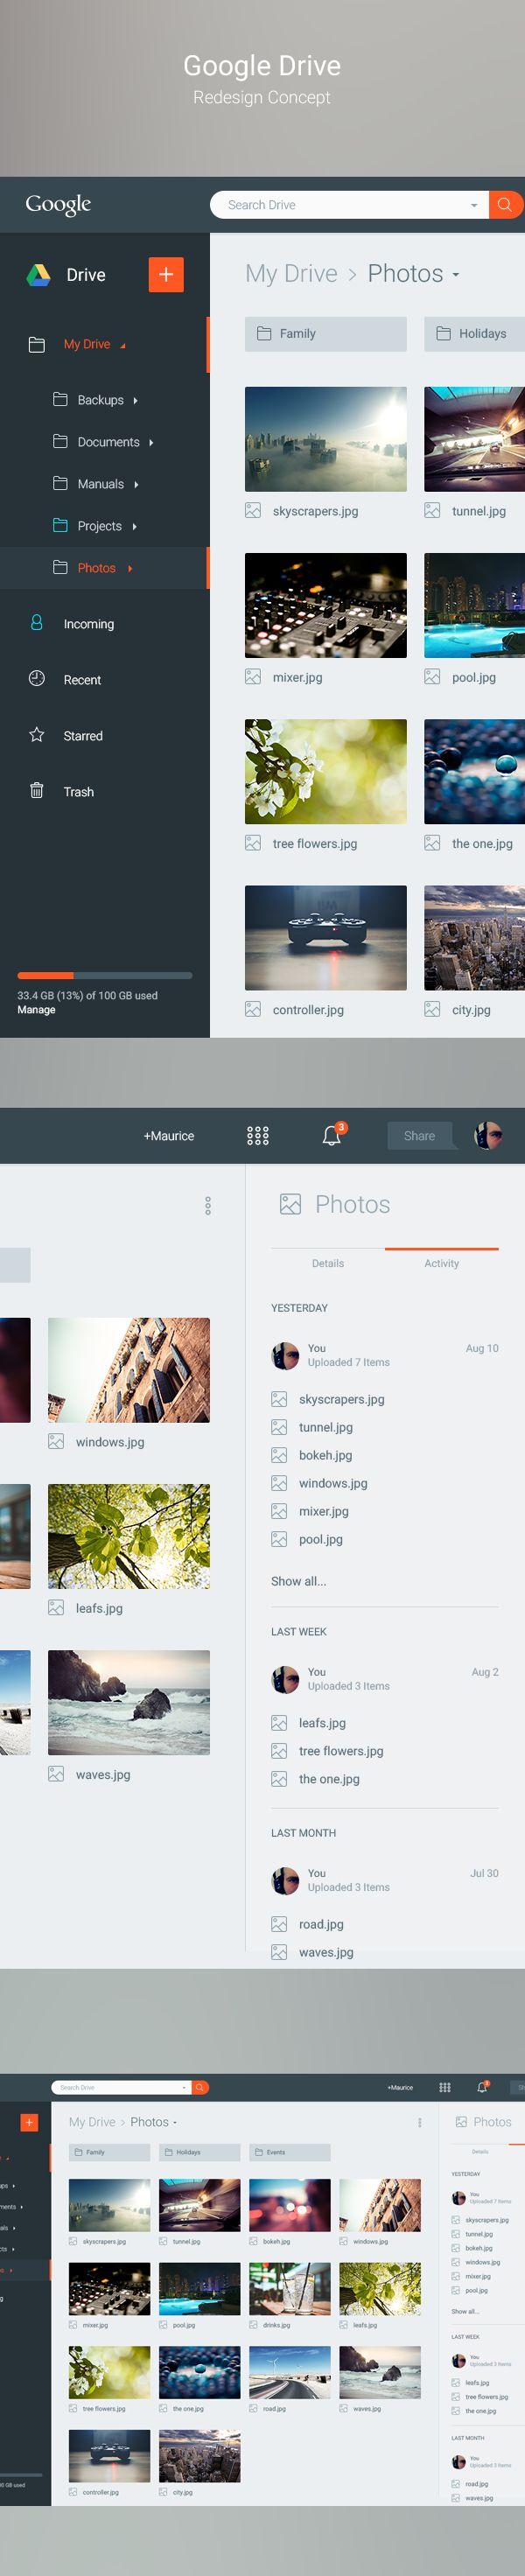 https://www.behance.net/gallery/23064001/Google-Drive-Redesign-Concept?utm_medium=email